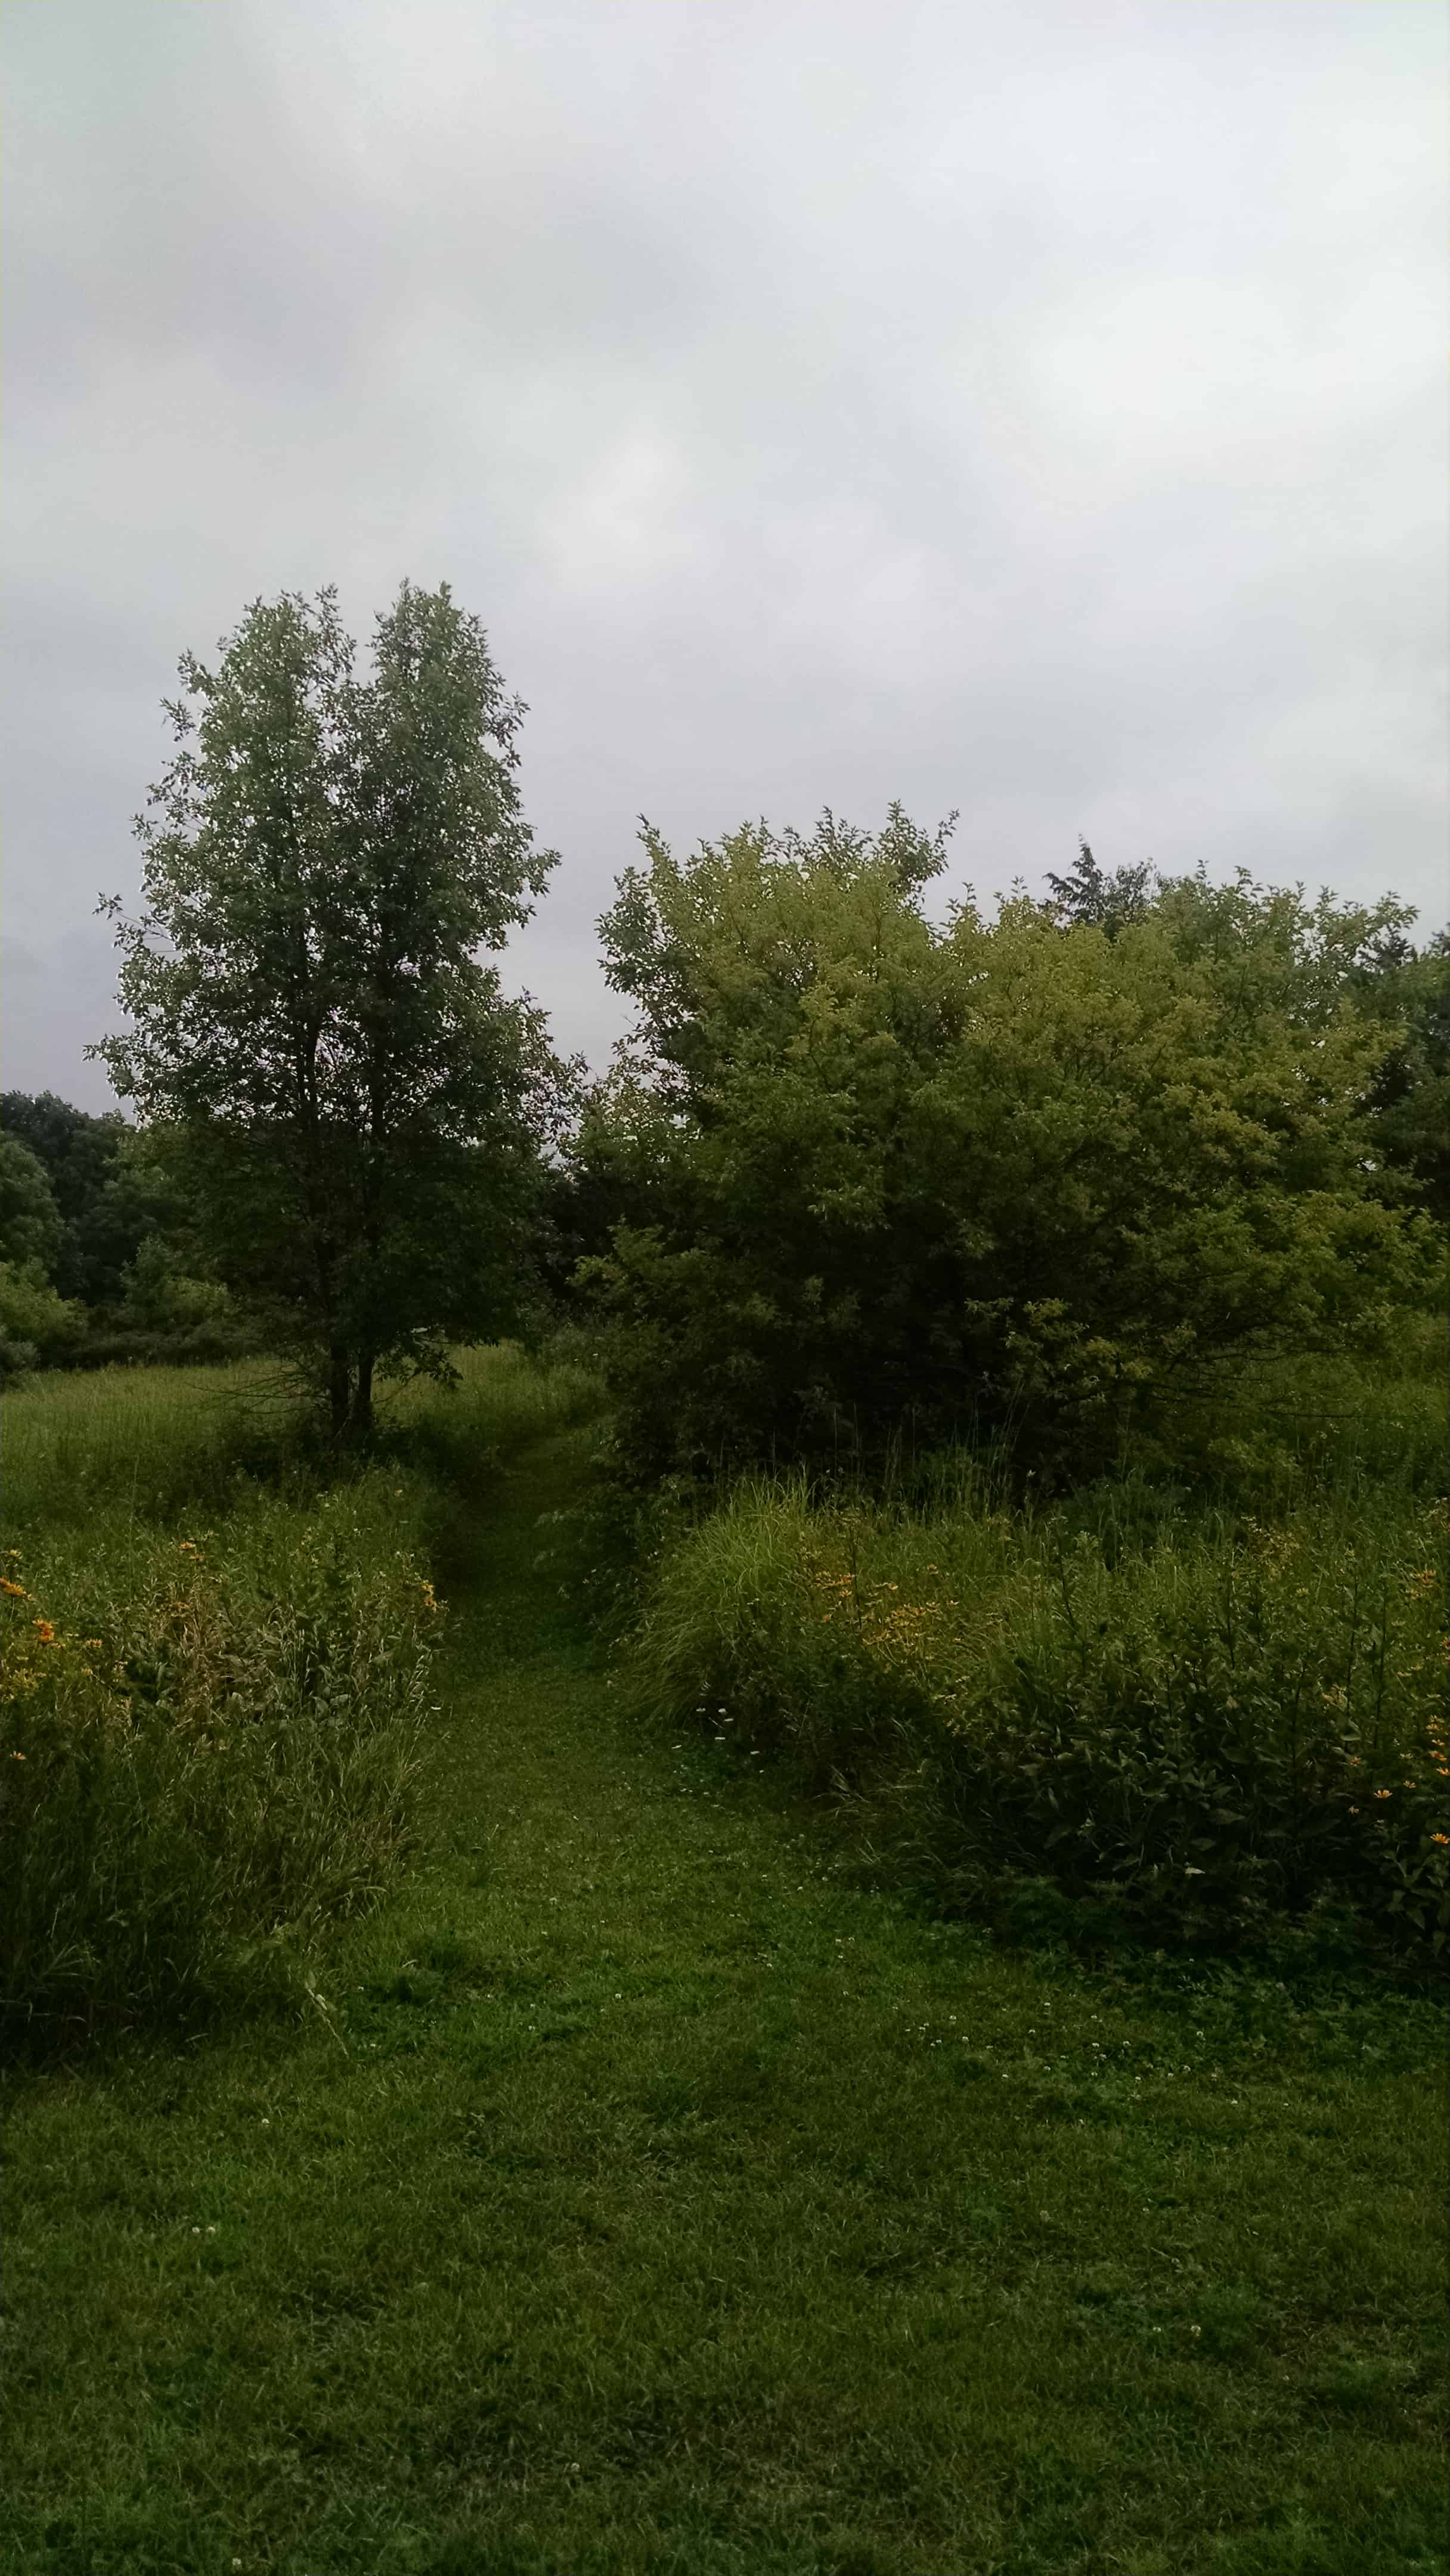 choosing fruit trees for the backyard